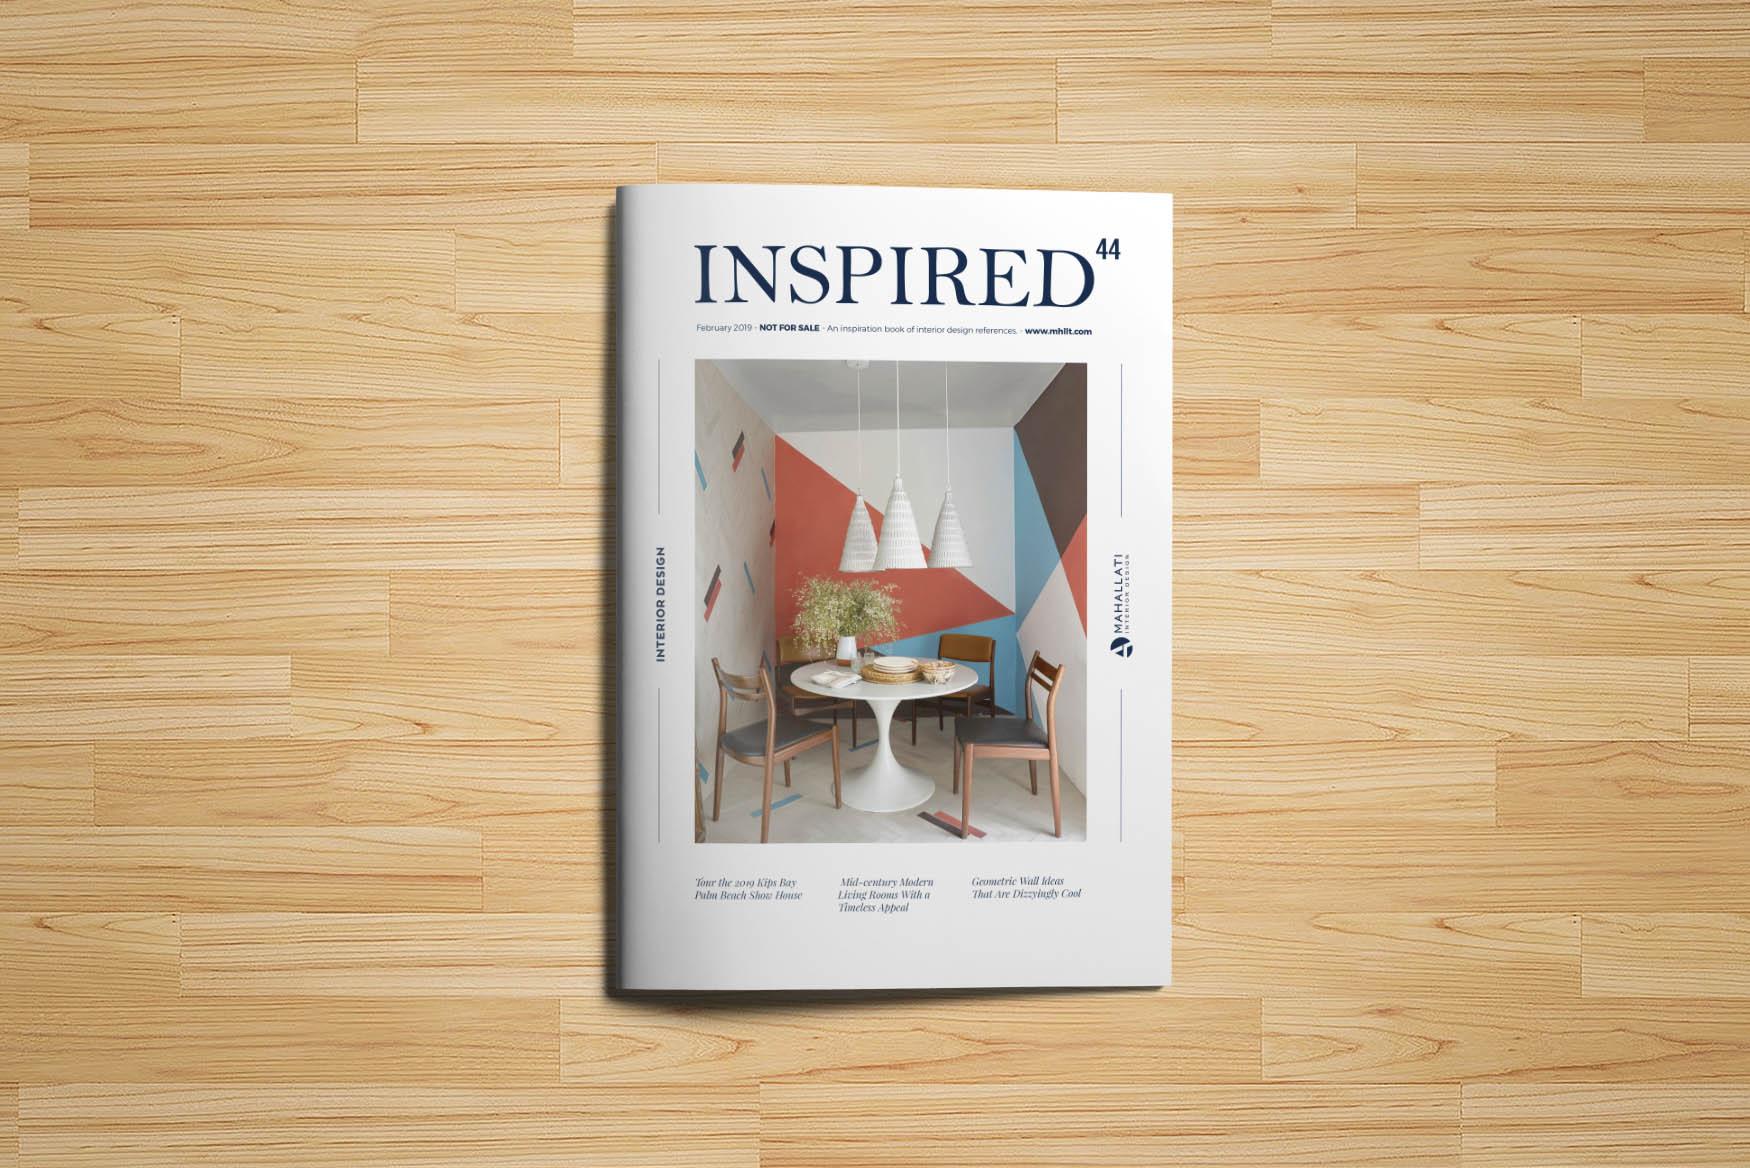 Inspired Vol 44 - February 2019